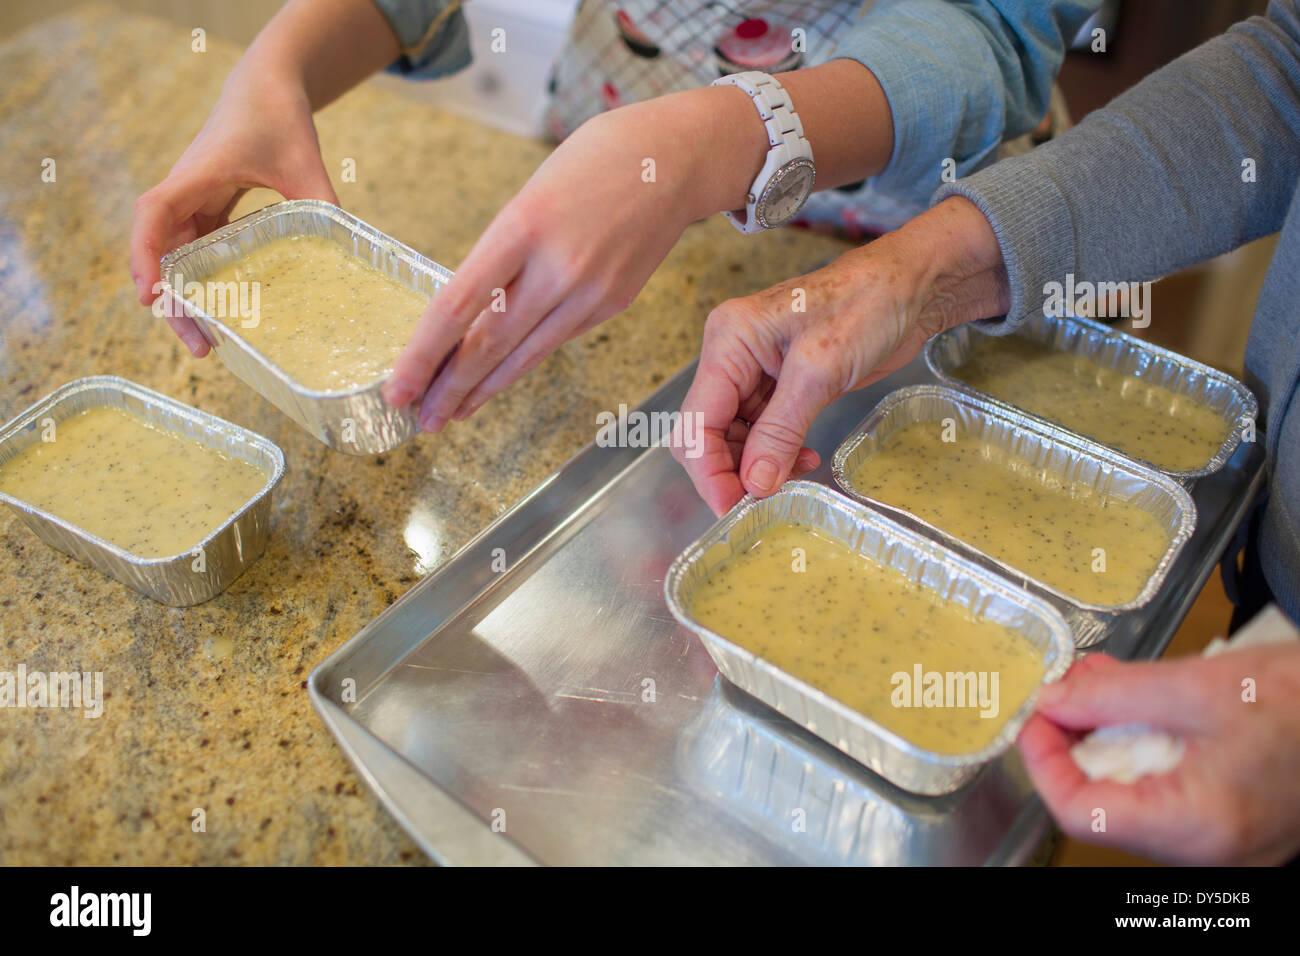 Senior woman and granddaughter preparing baking tins - Stock Image